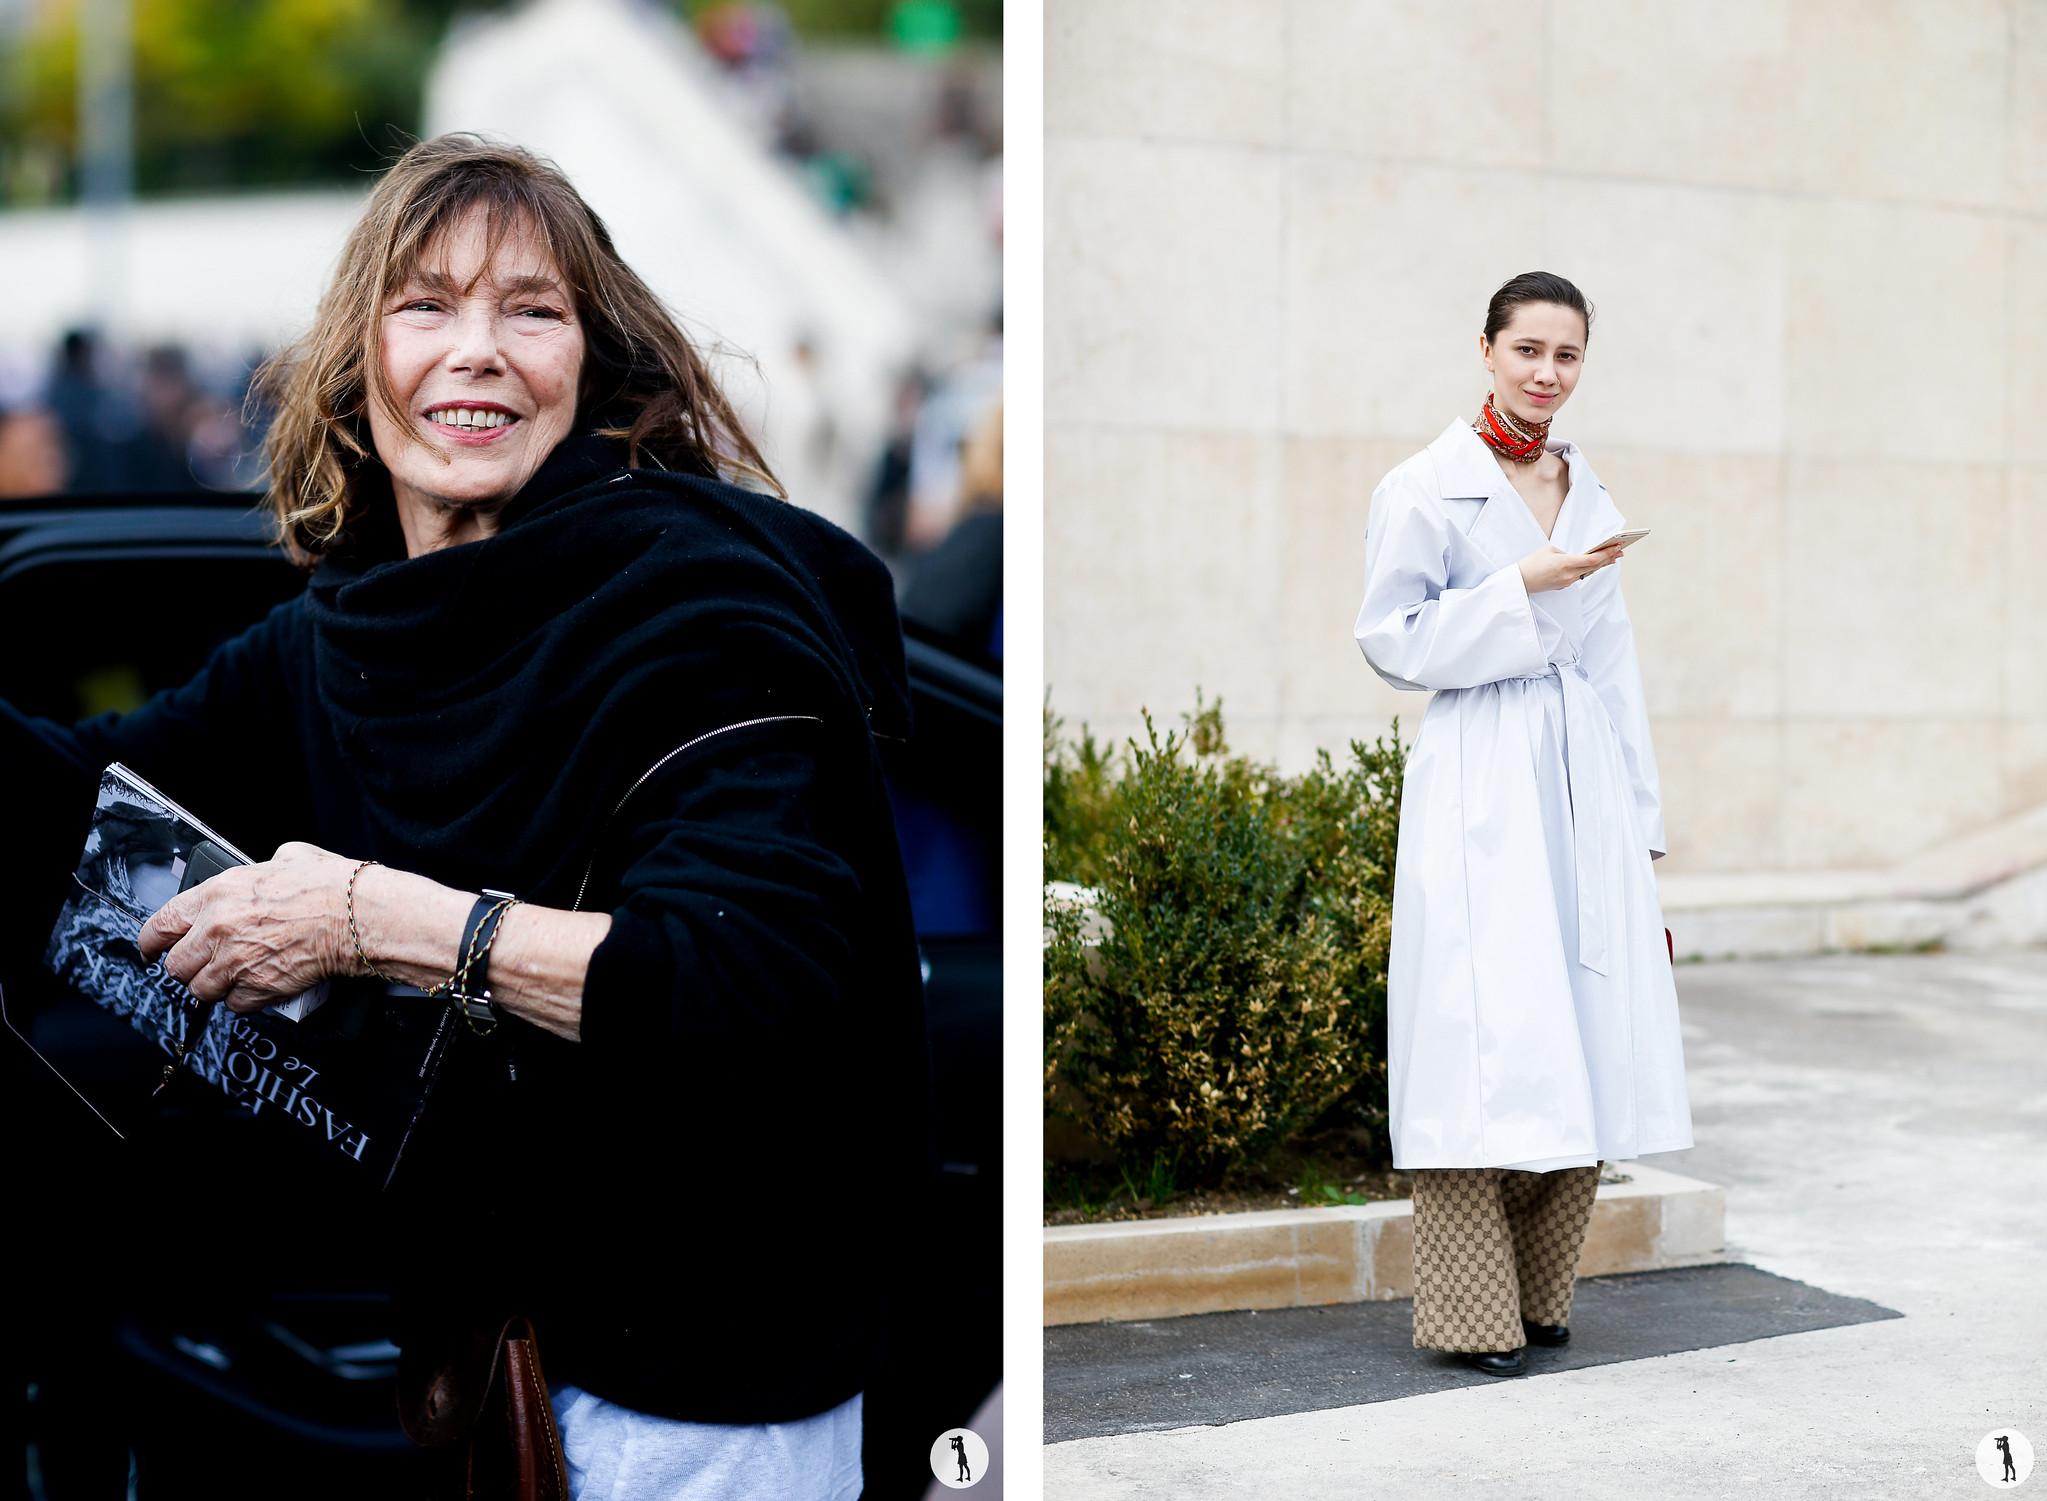 Jane Birkin and Liza Gysevskaya - Paris Fashion Week SS18